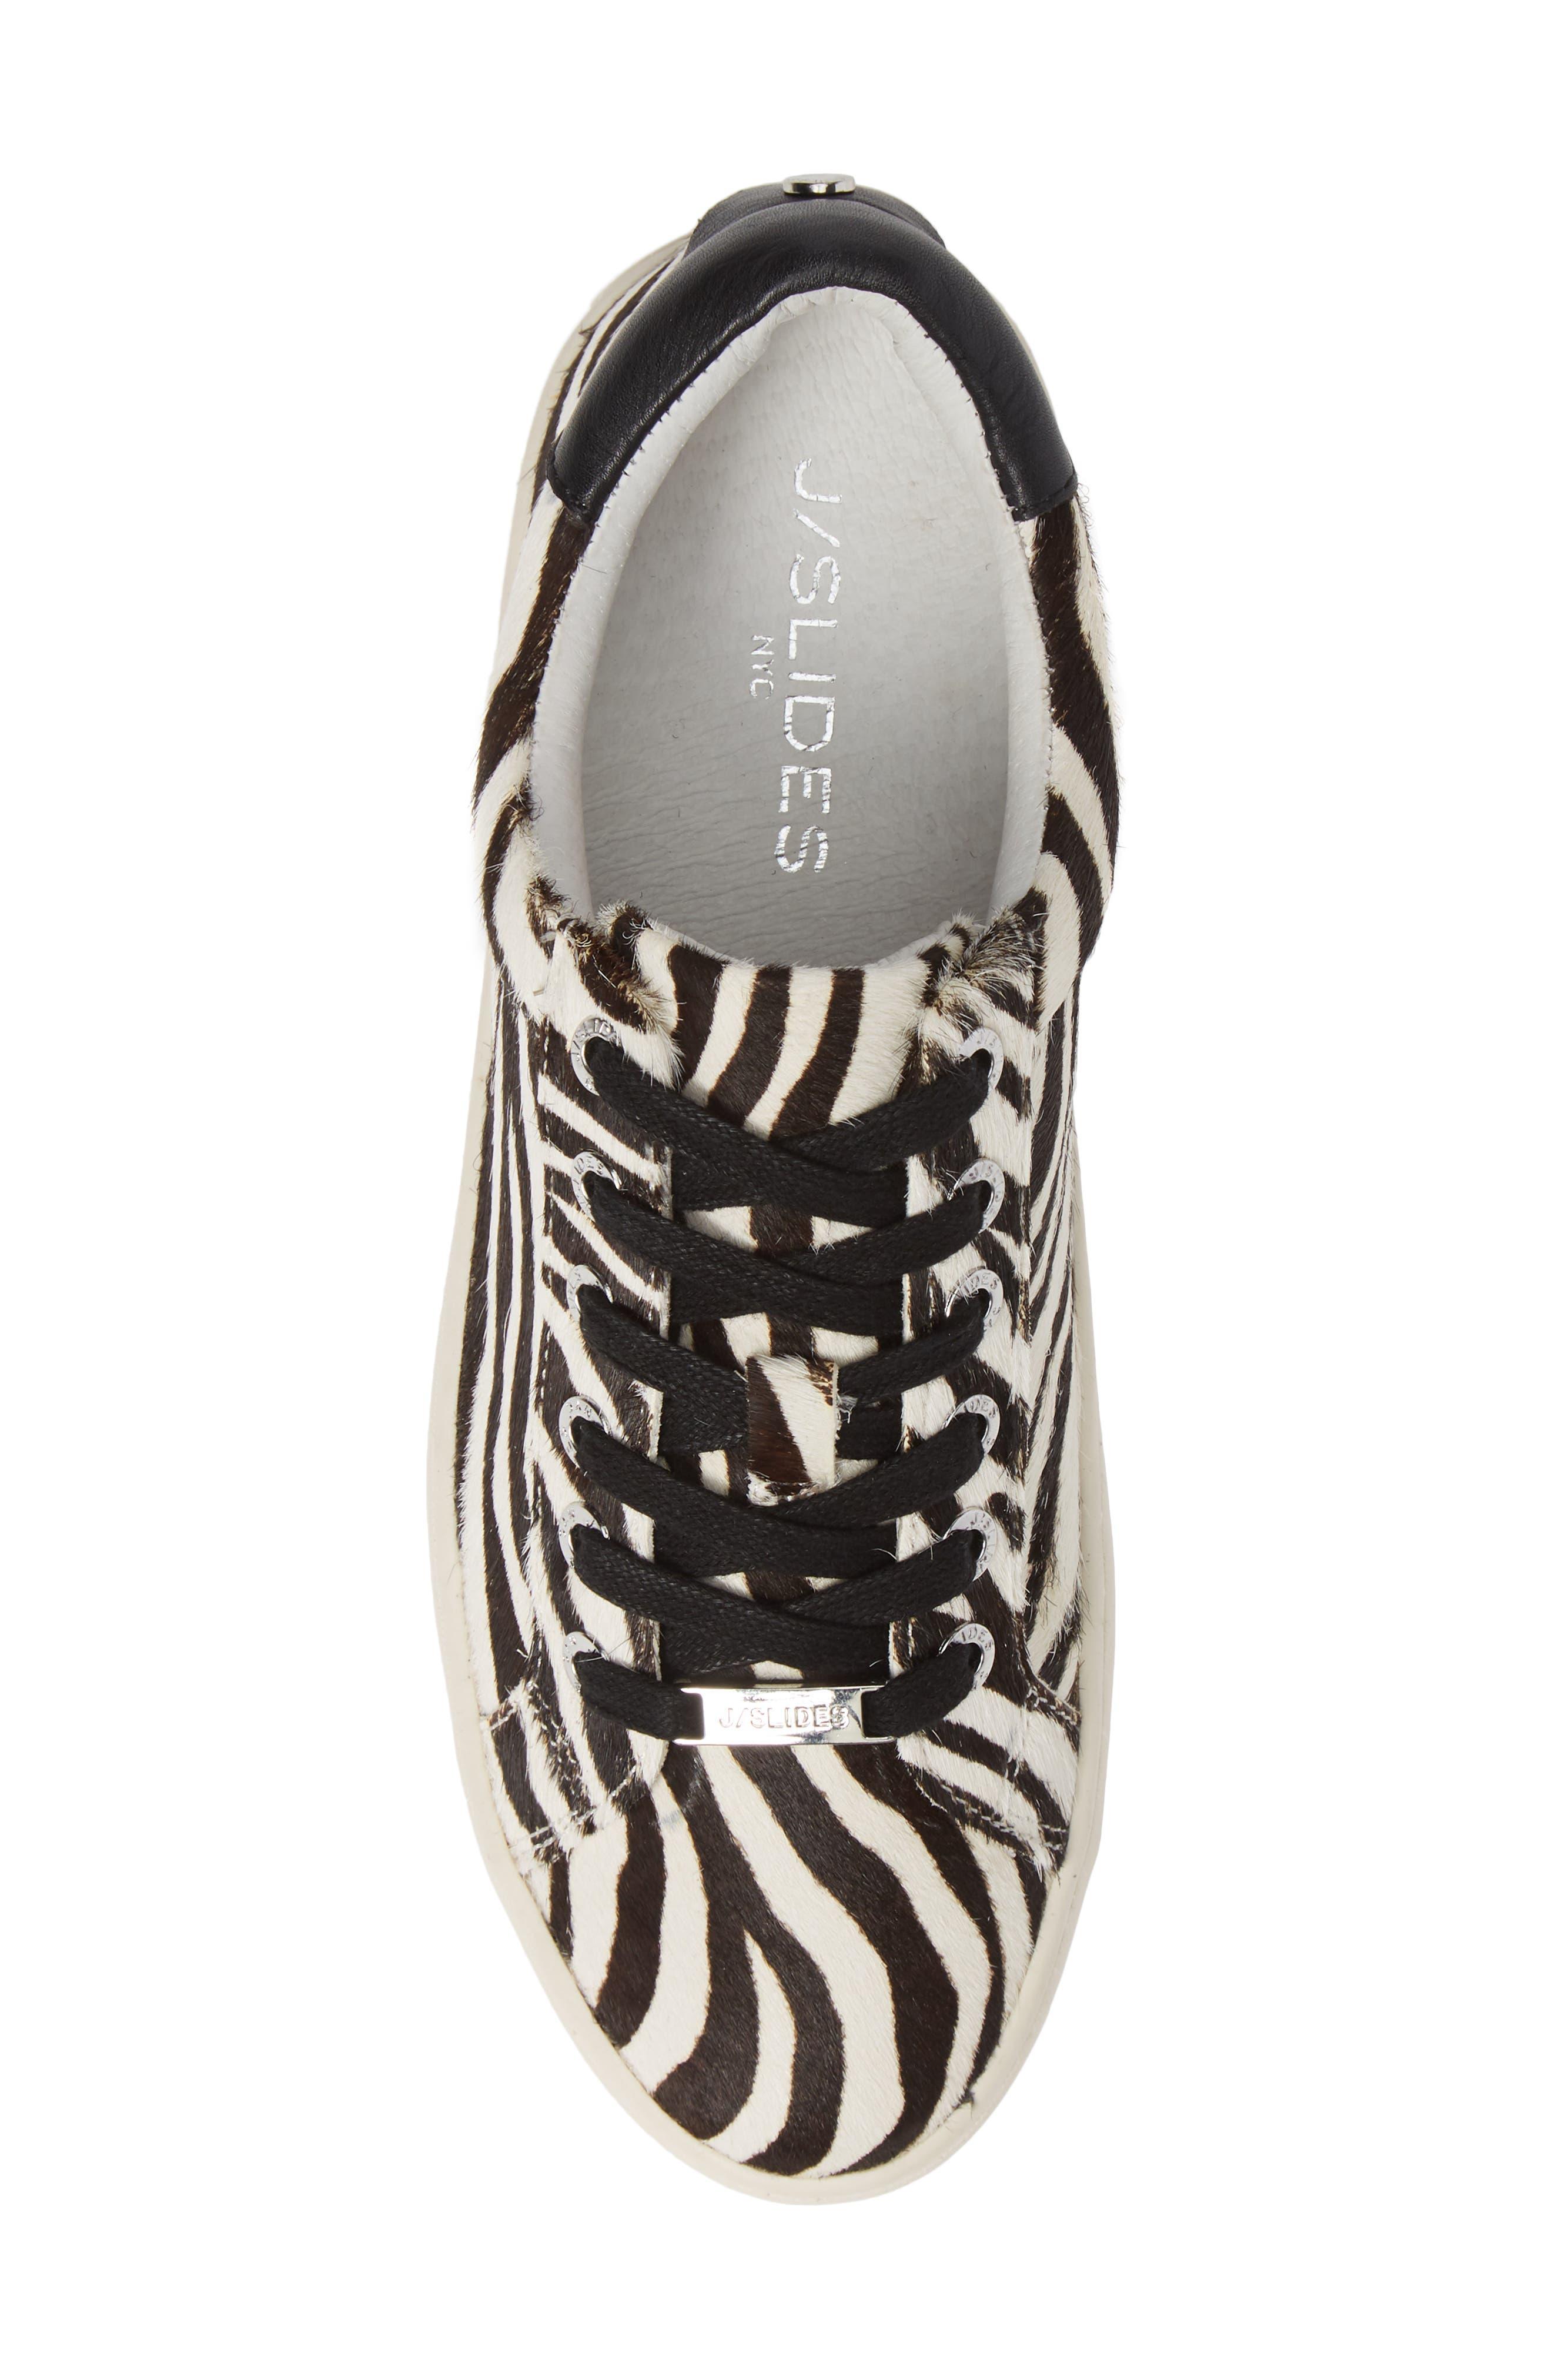 JSLIDES,                             Hippie Genuine Calf Hair Platform Sneaker,                             Alternate thumbnail 5, color,                             ZEBRA CALF HAIR